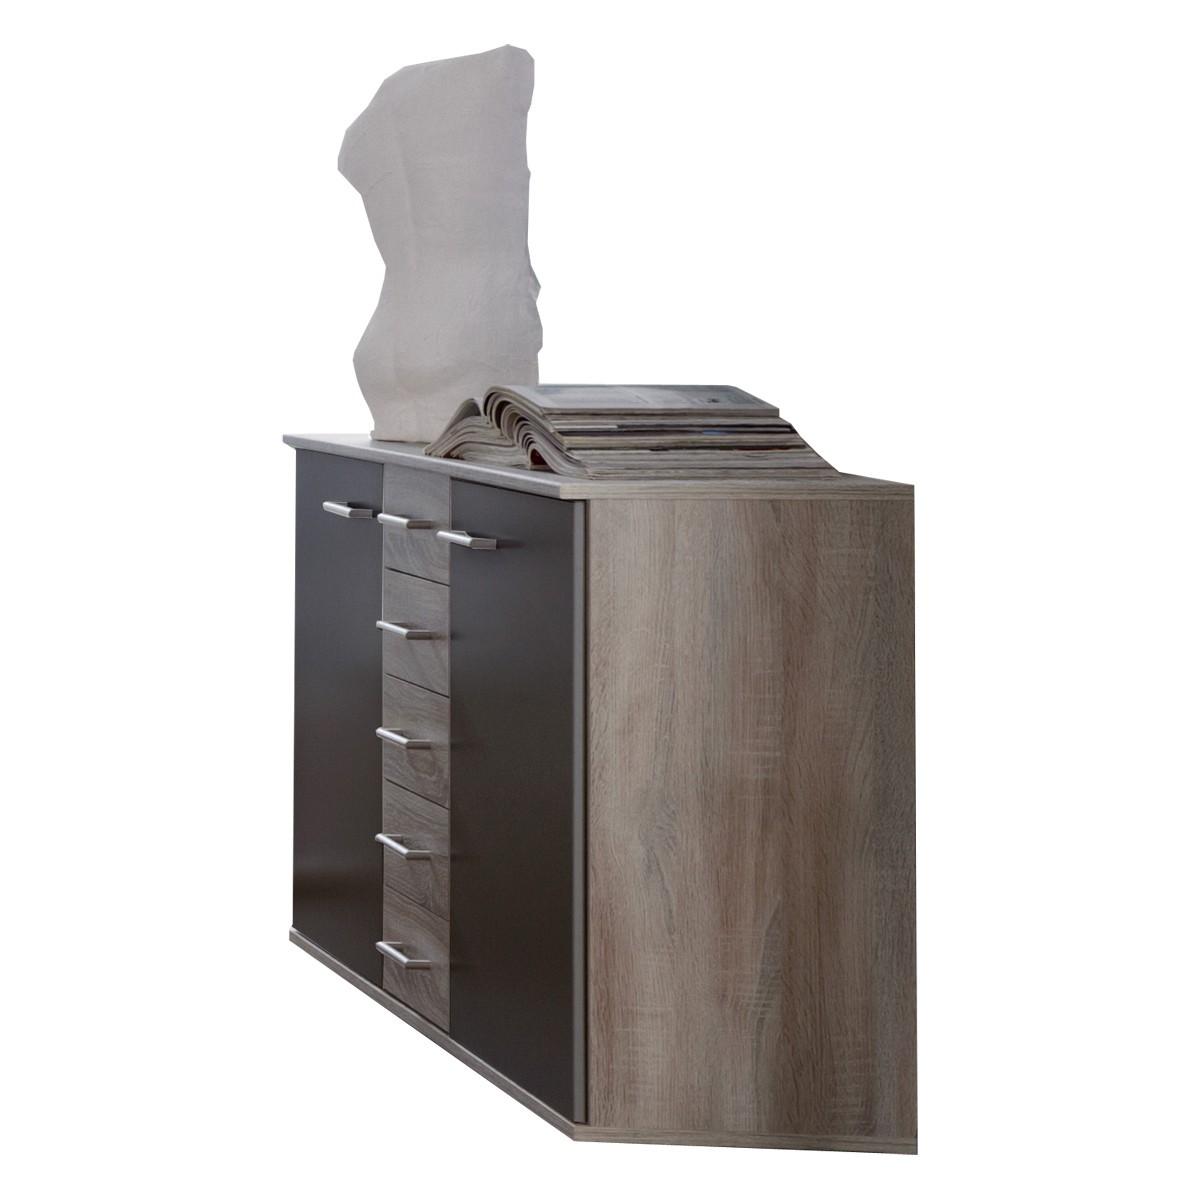 sideboard kommode kombikommode anrichte montana eiche und lava ebay. Black Bedroom Furniture Sets. Home Design Ideas